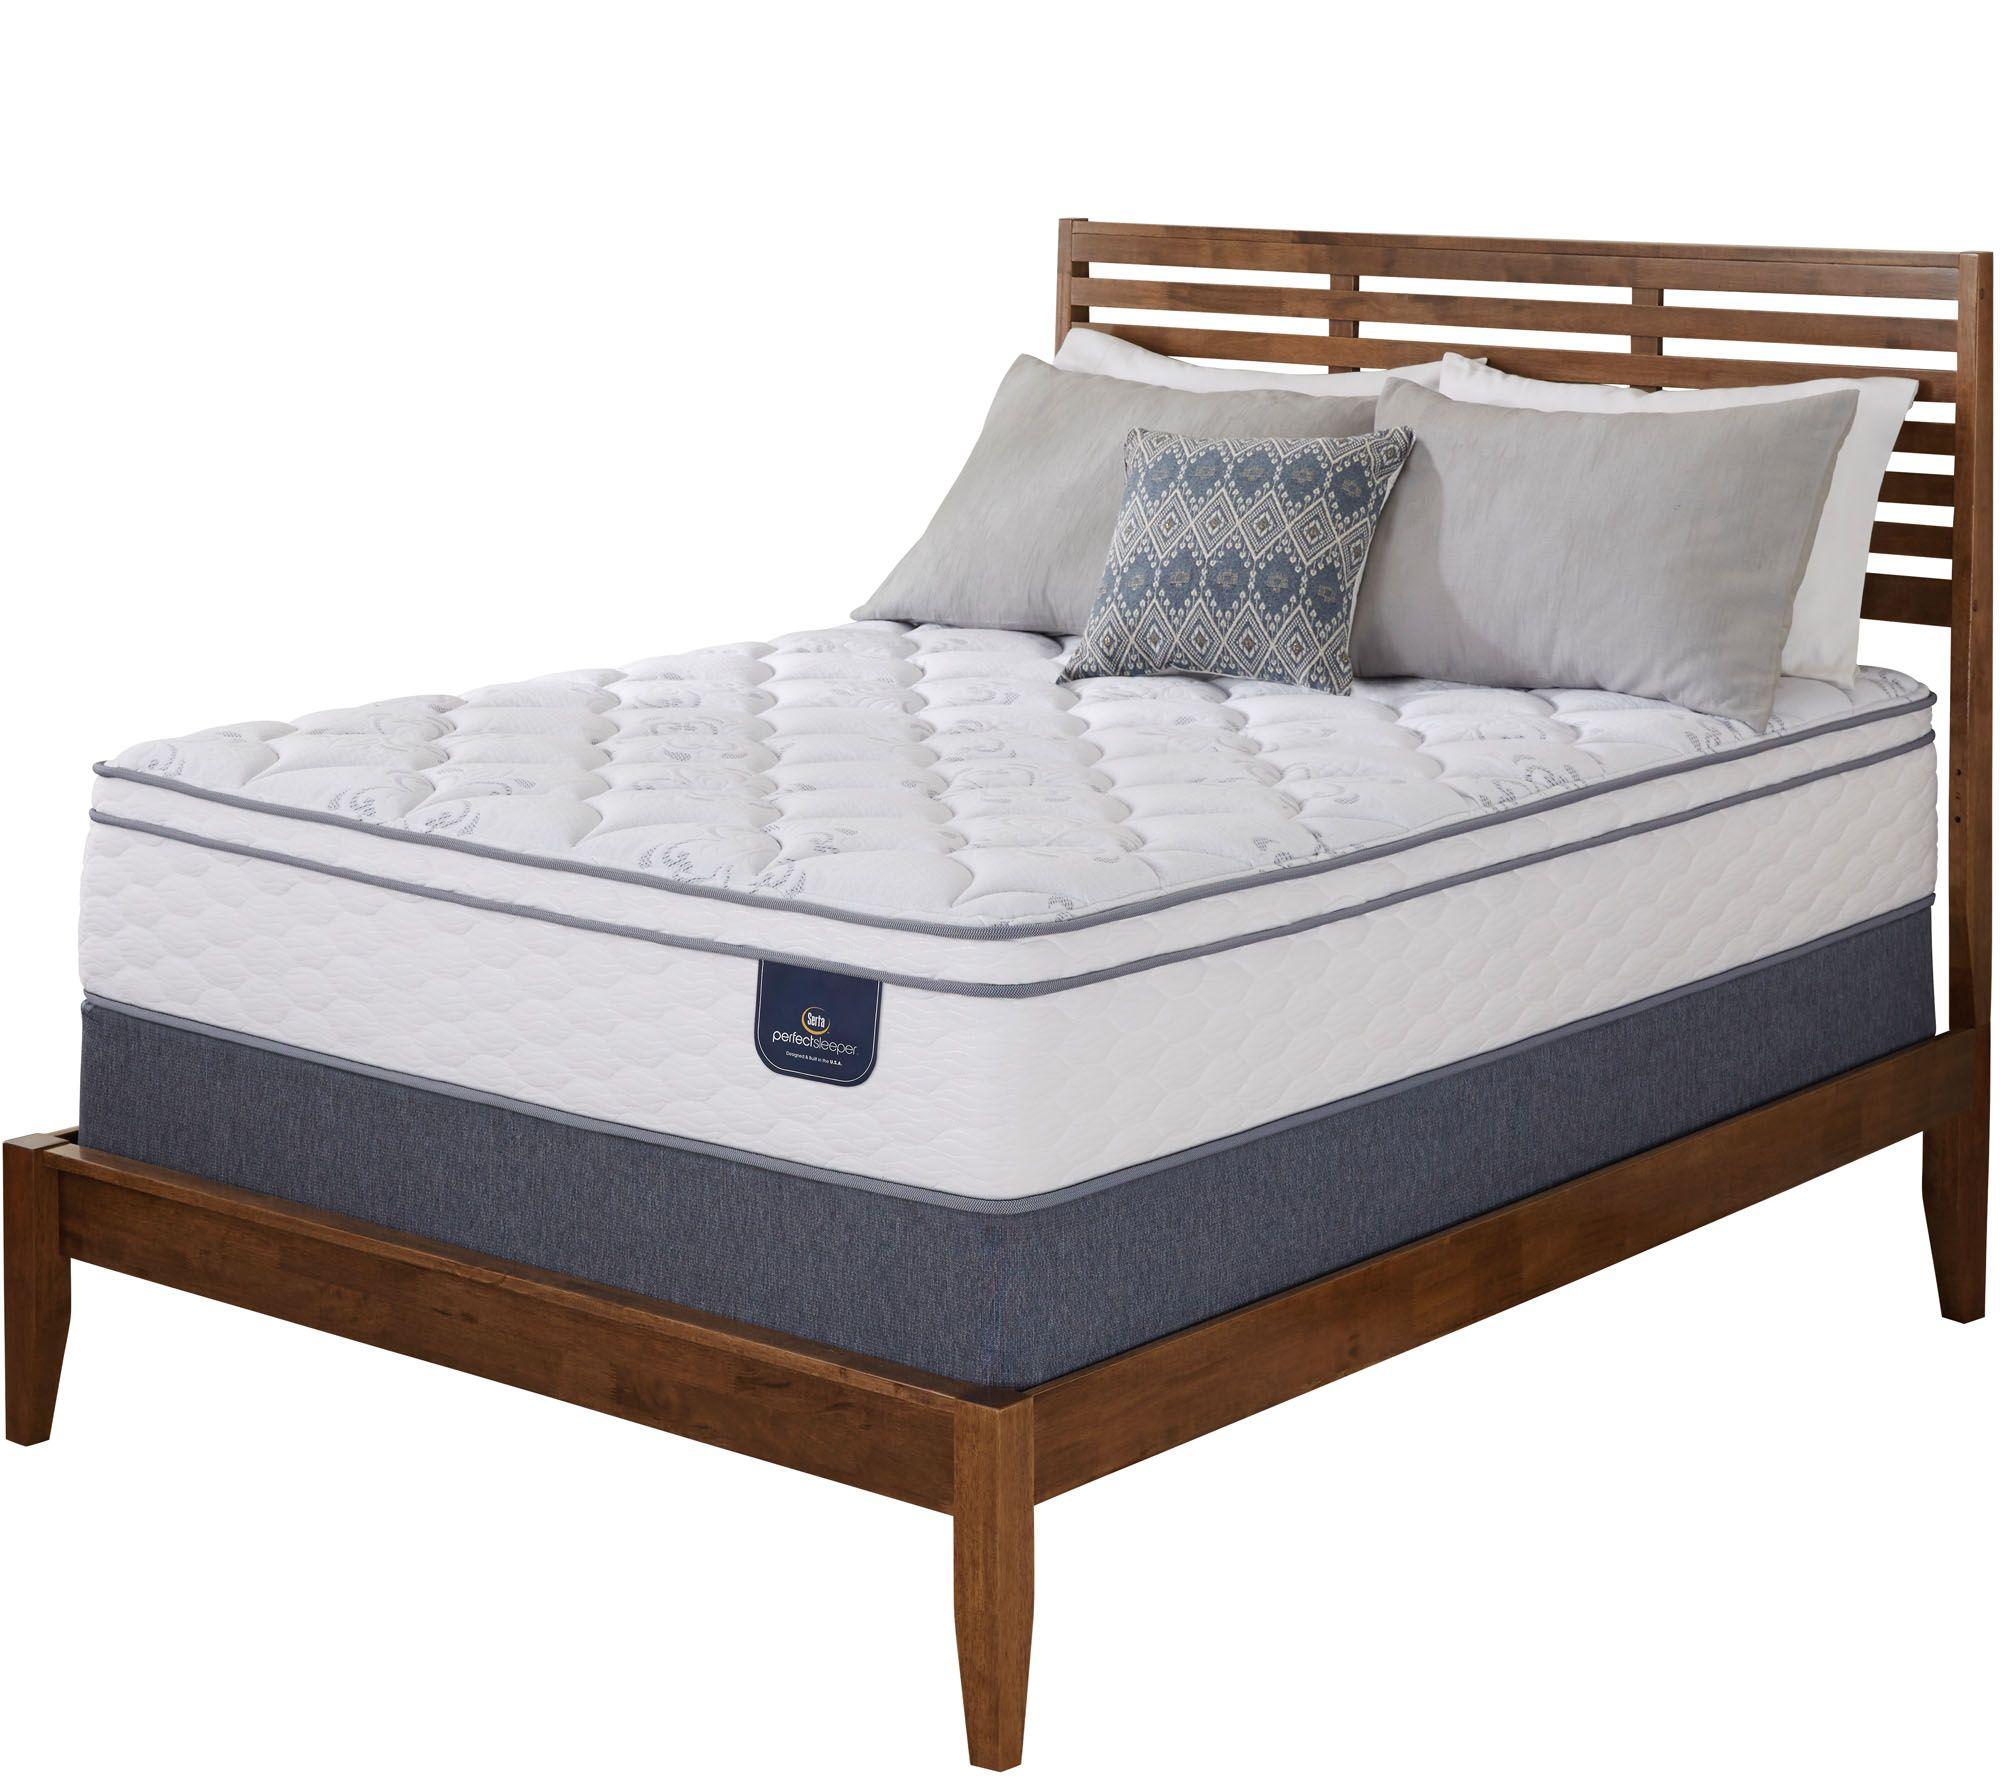 serta perfect sleeper freeport eurotop queen mattress set page 1 u2014 qvccom